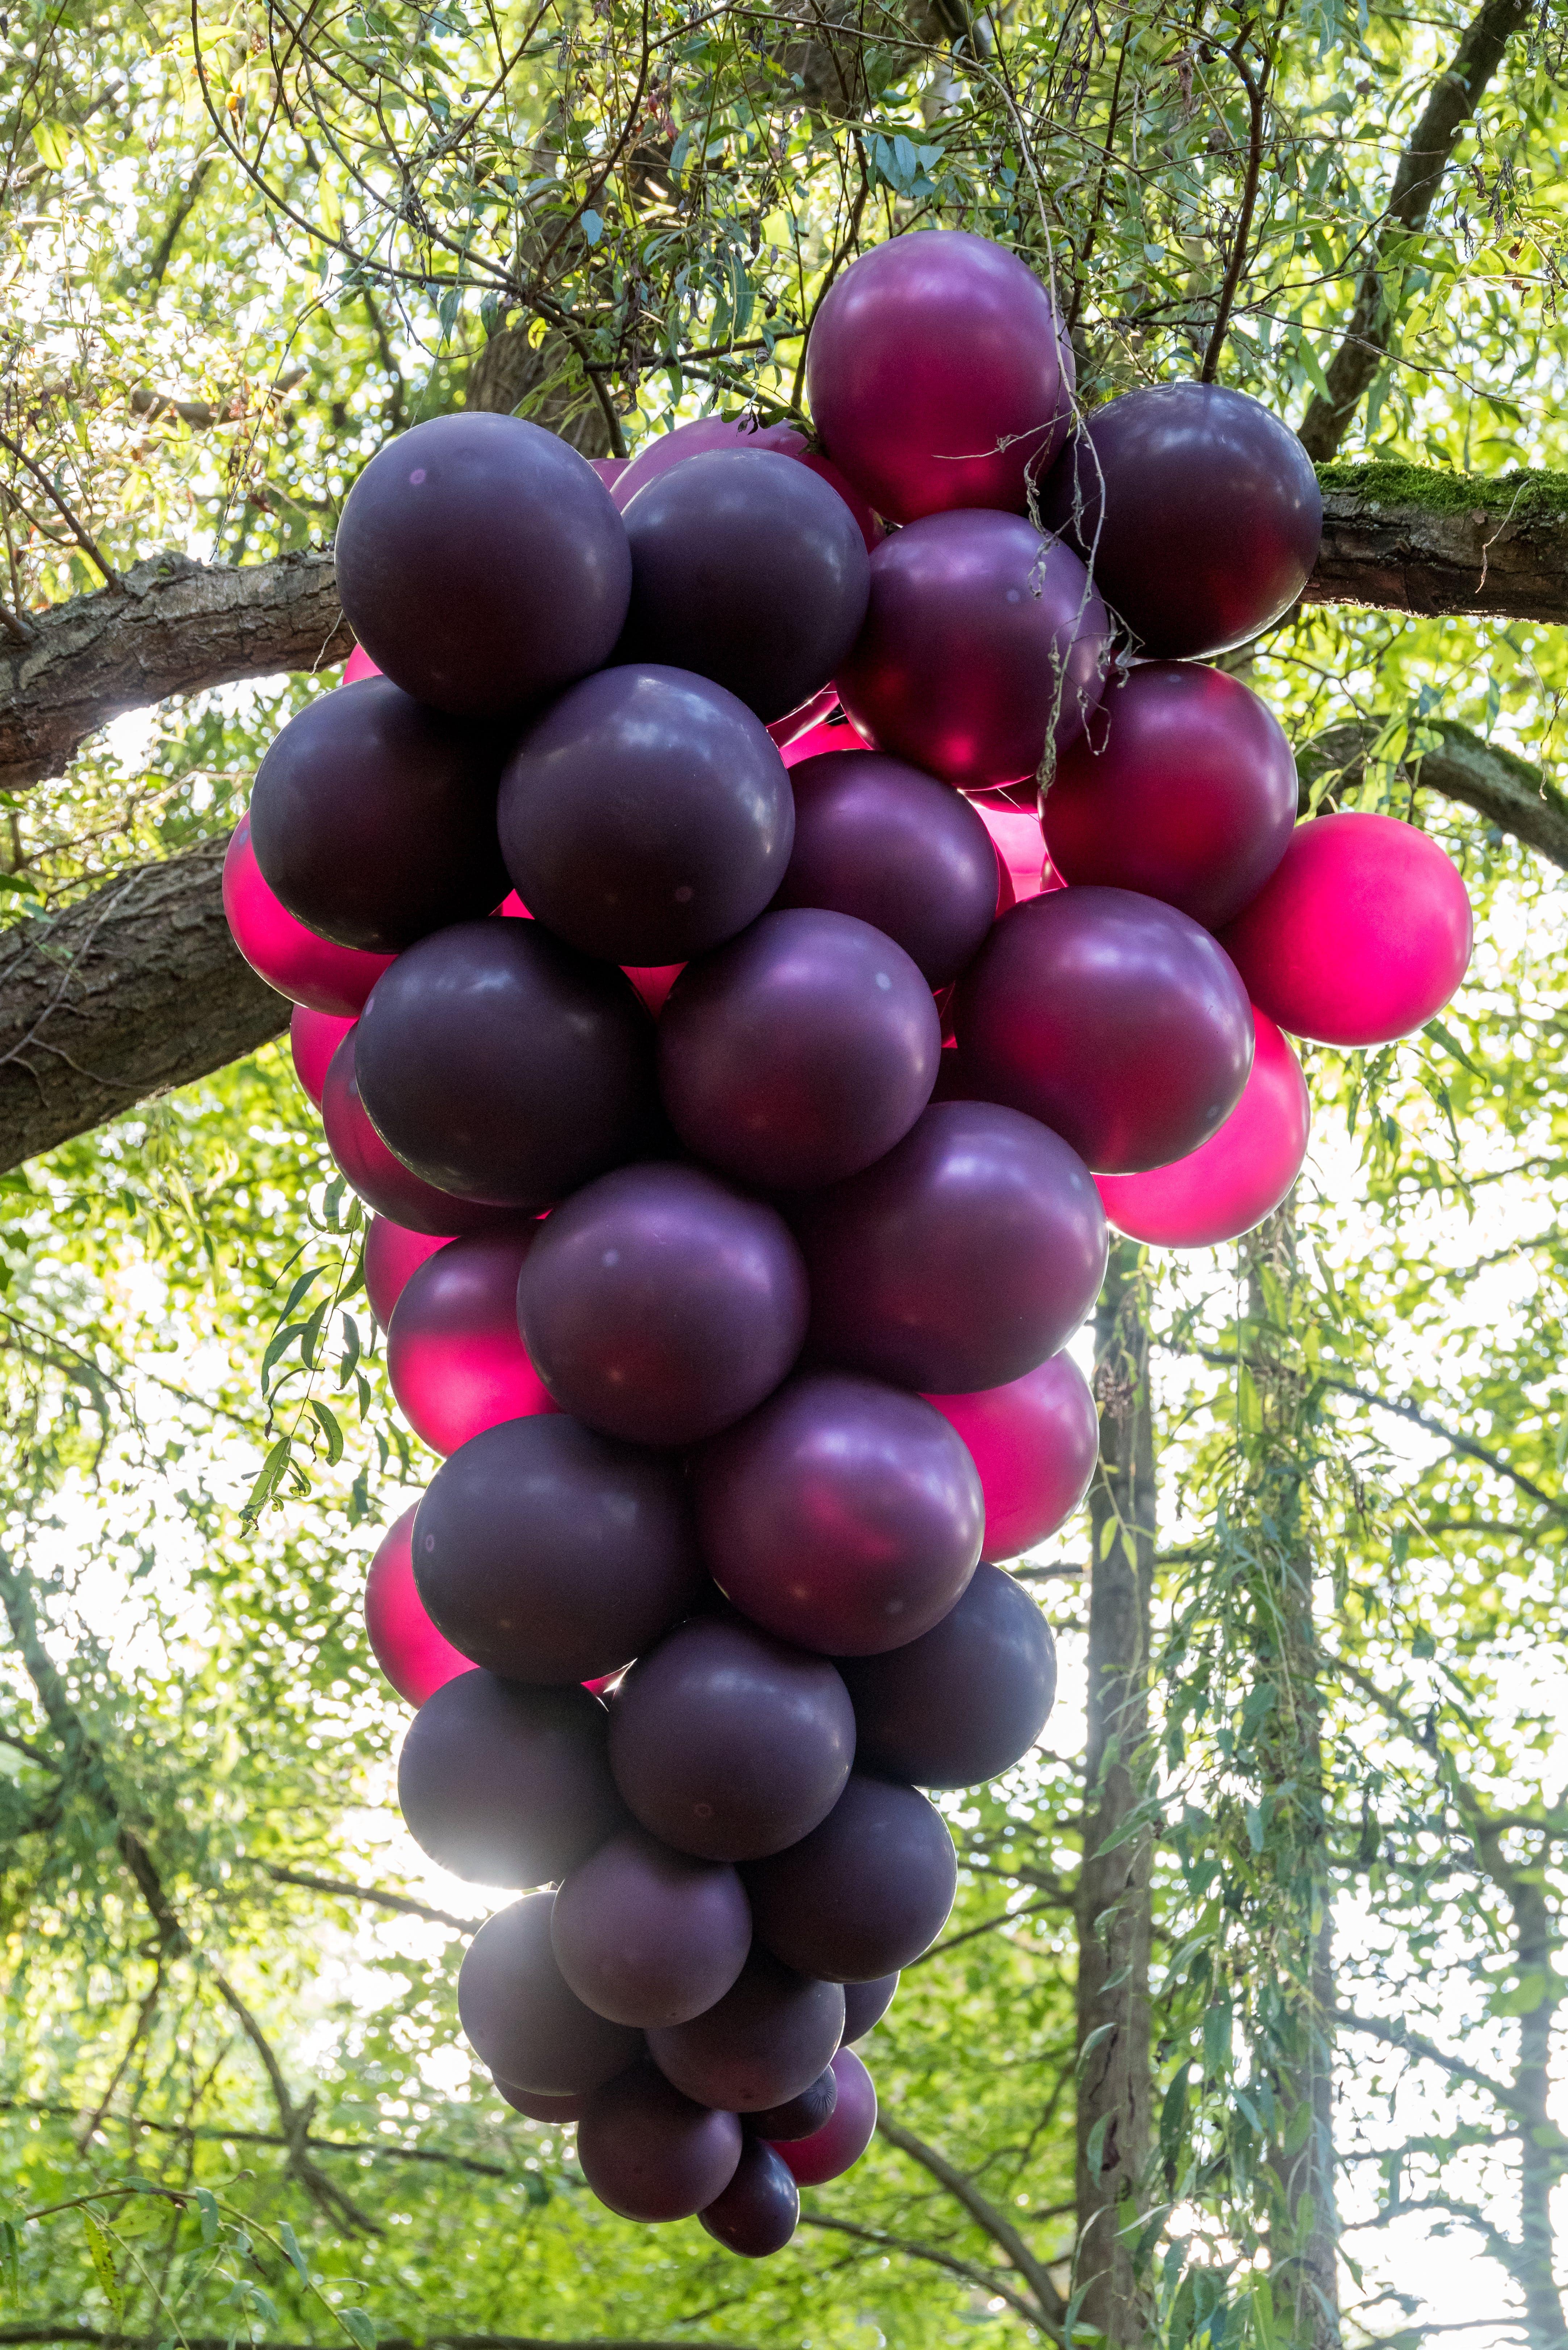 Free stock photo of balloons, giant grape, grape, grapefruit